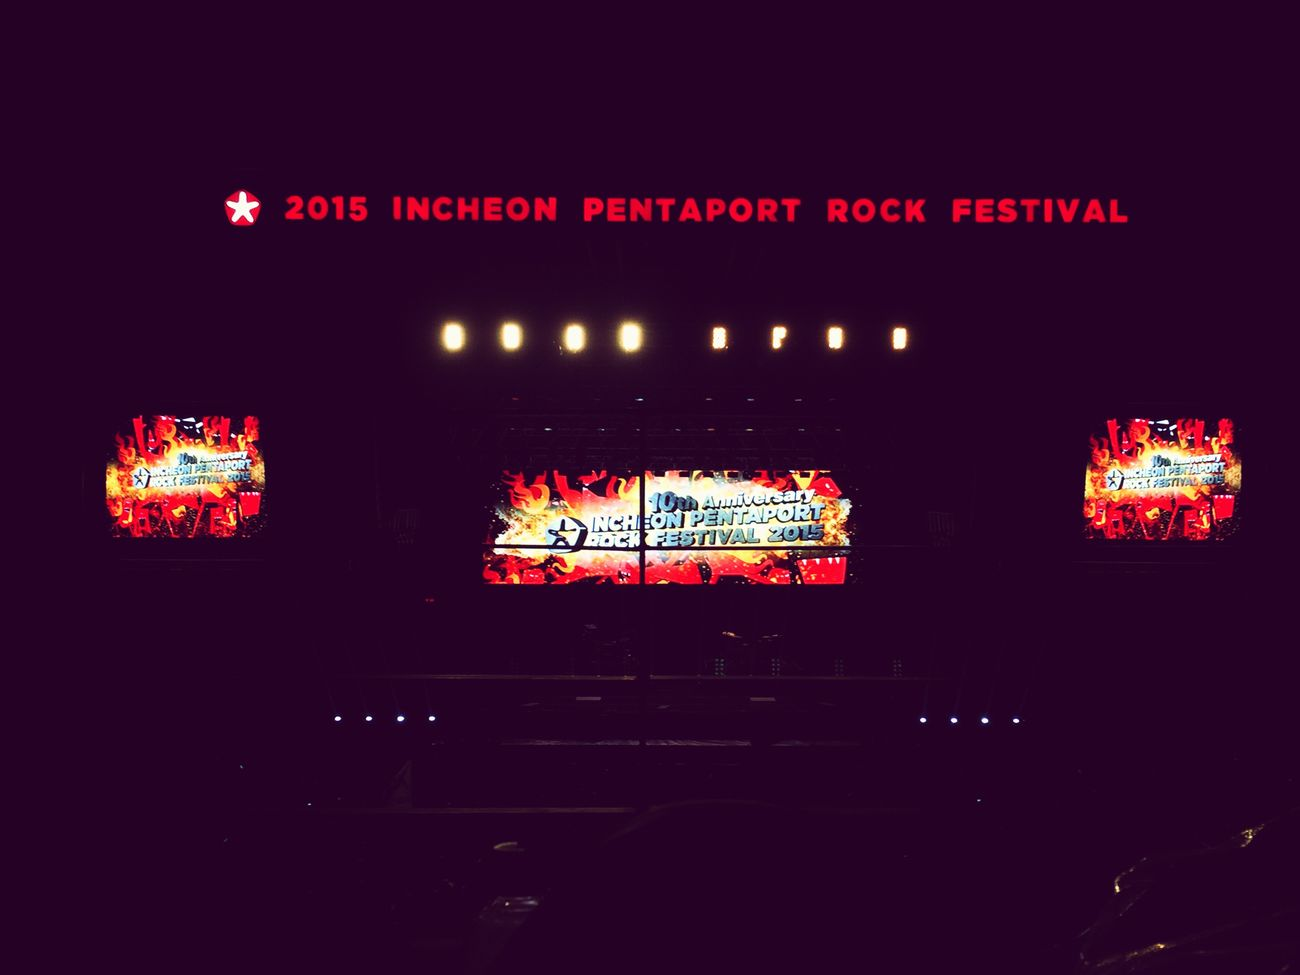 Pentaport 2015